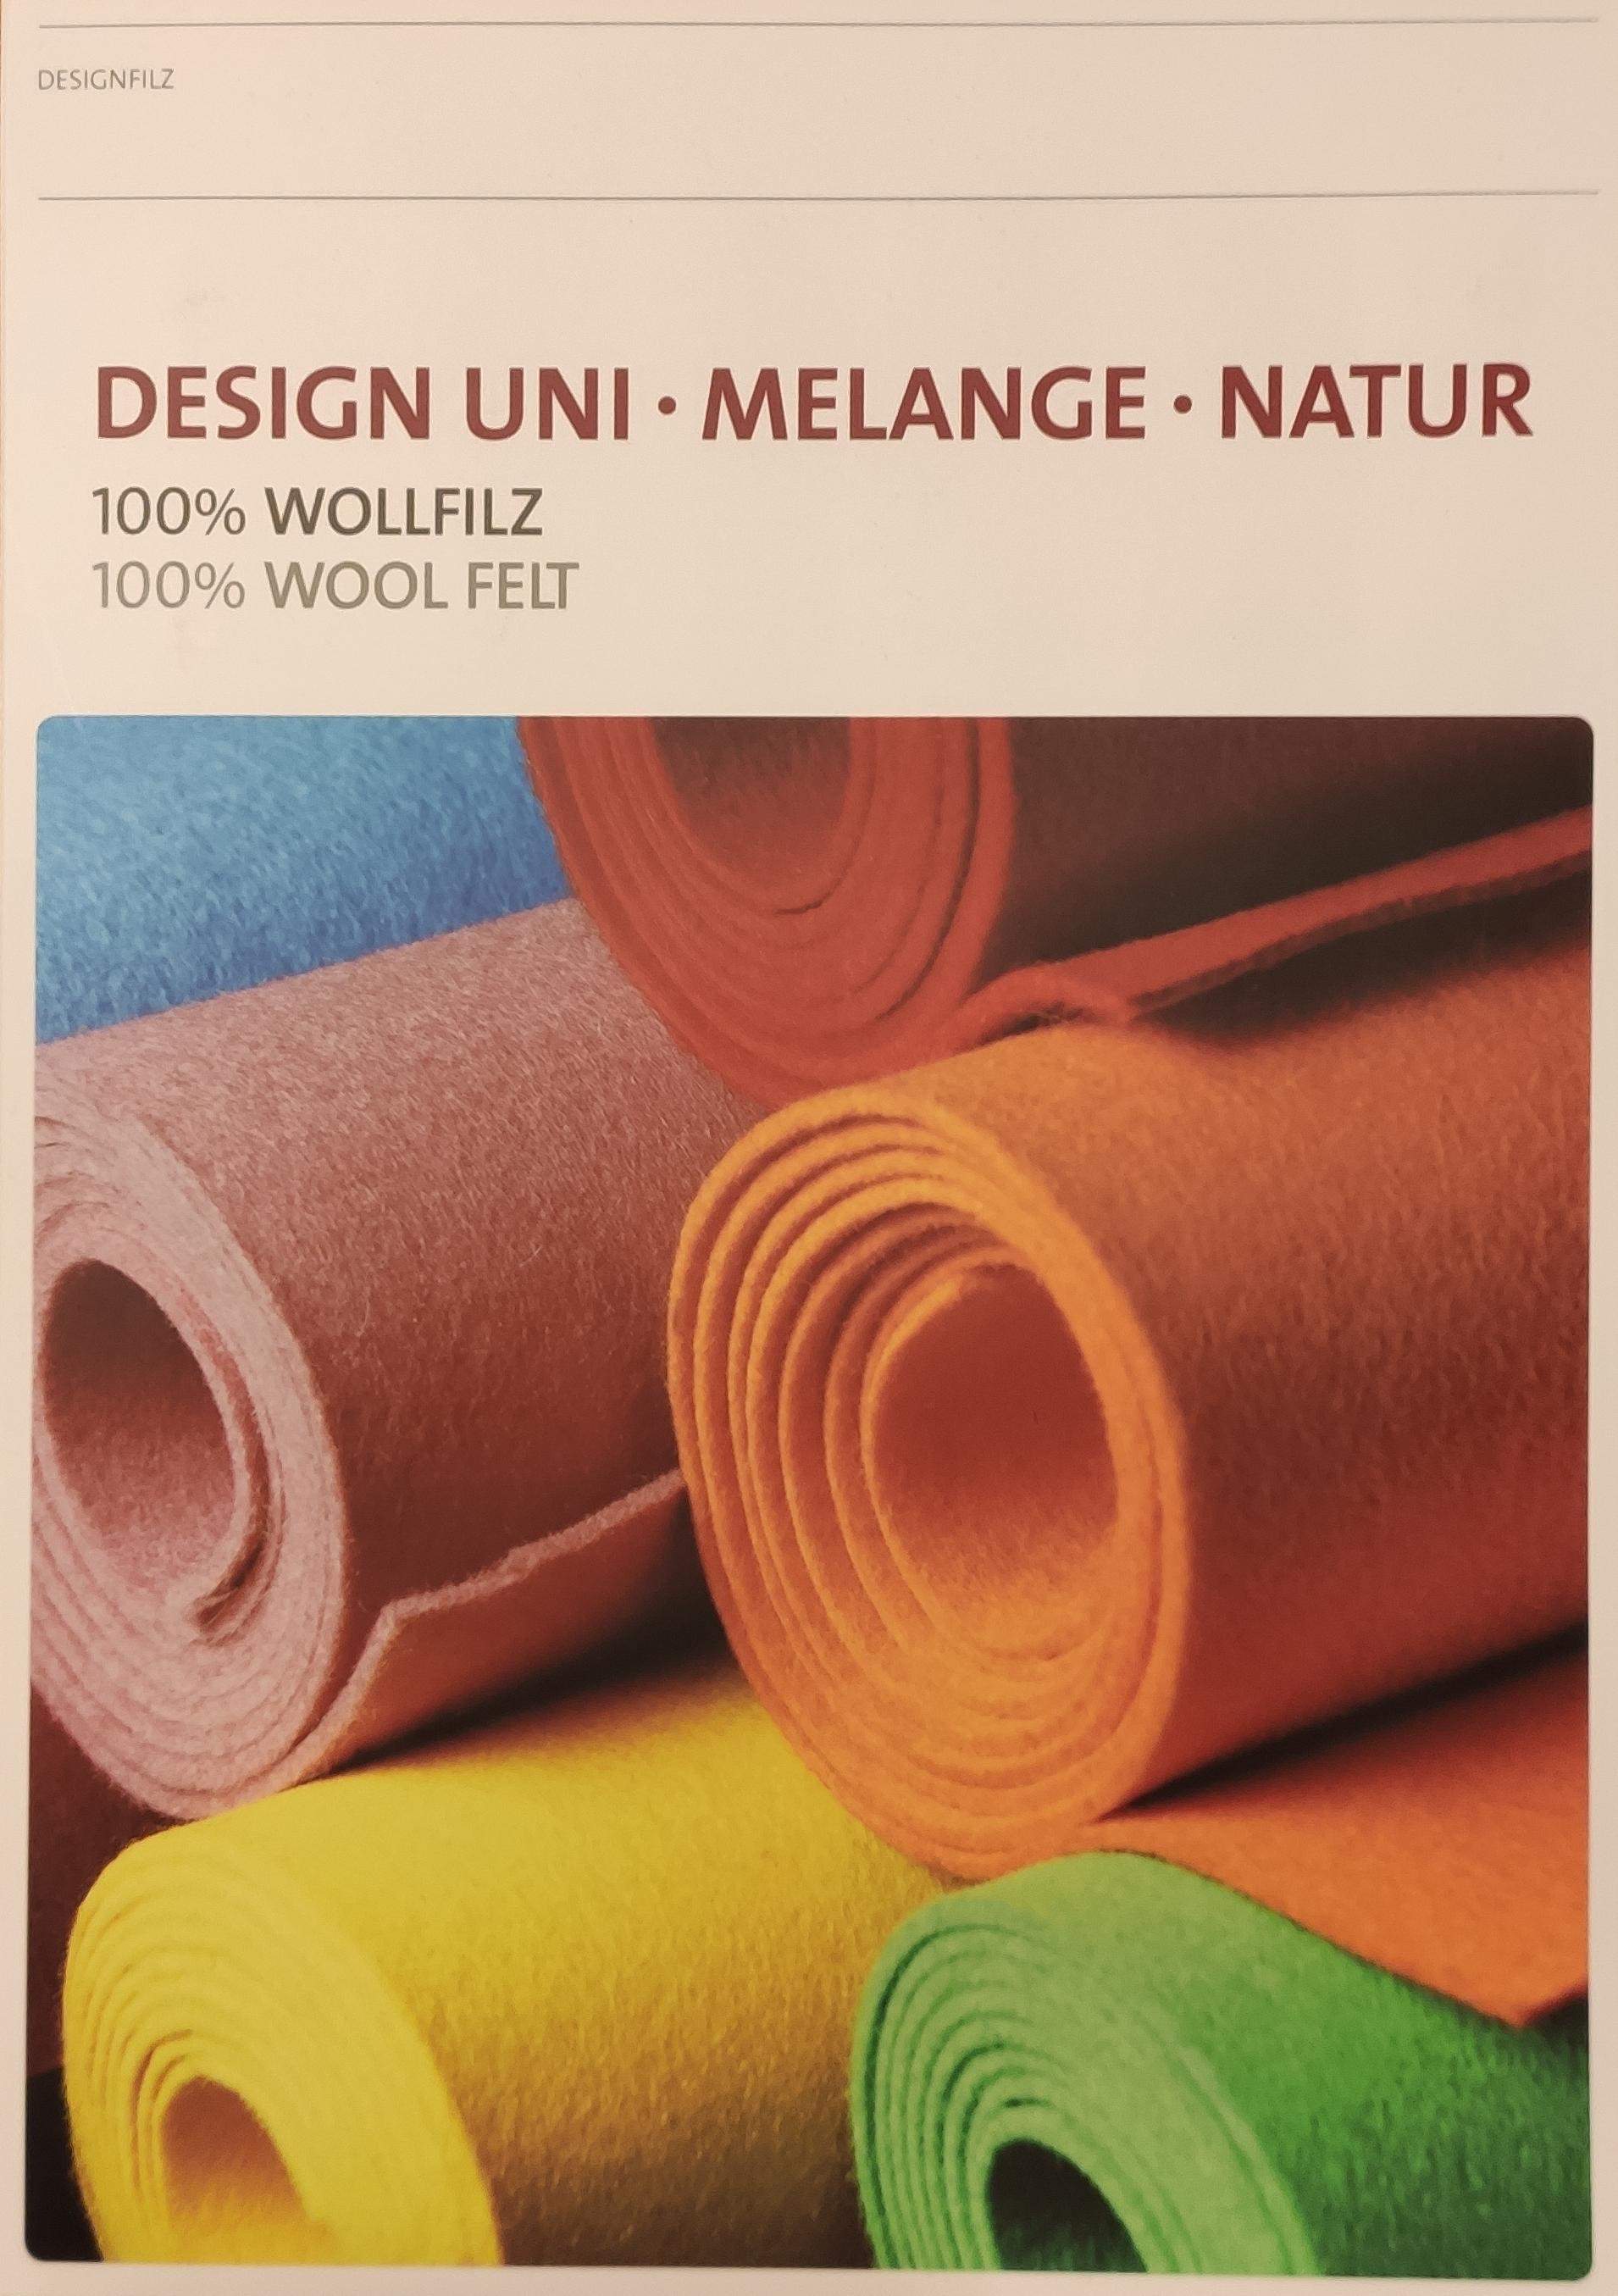 Farb- und Griffmusterkarte, Designfilz uni, melange, natur